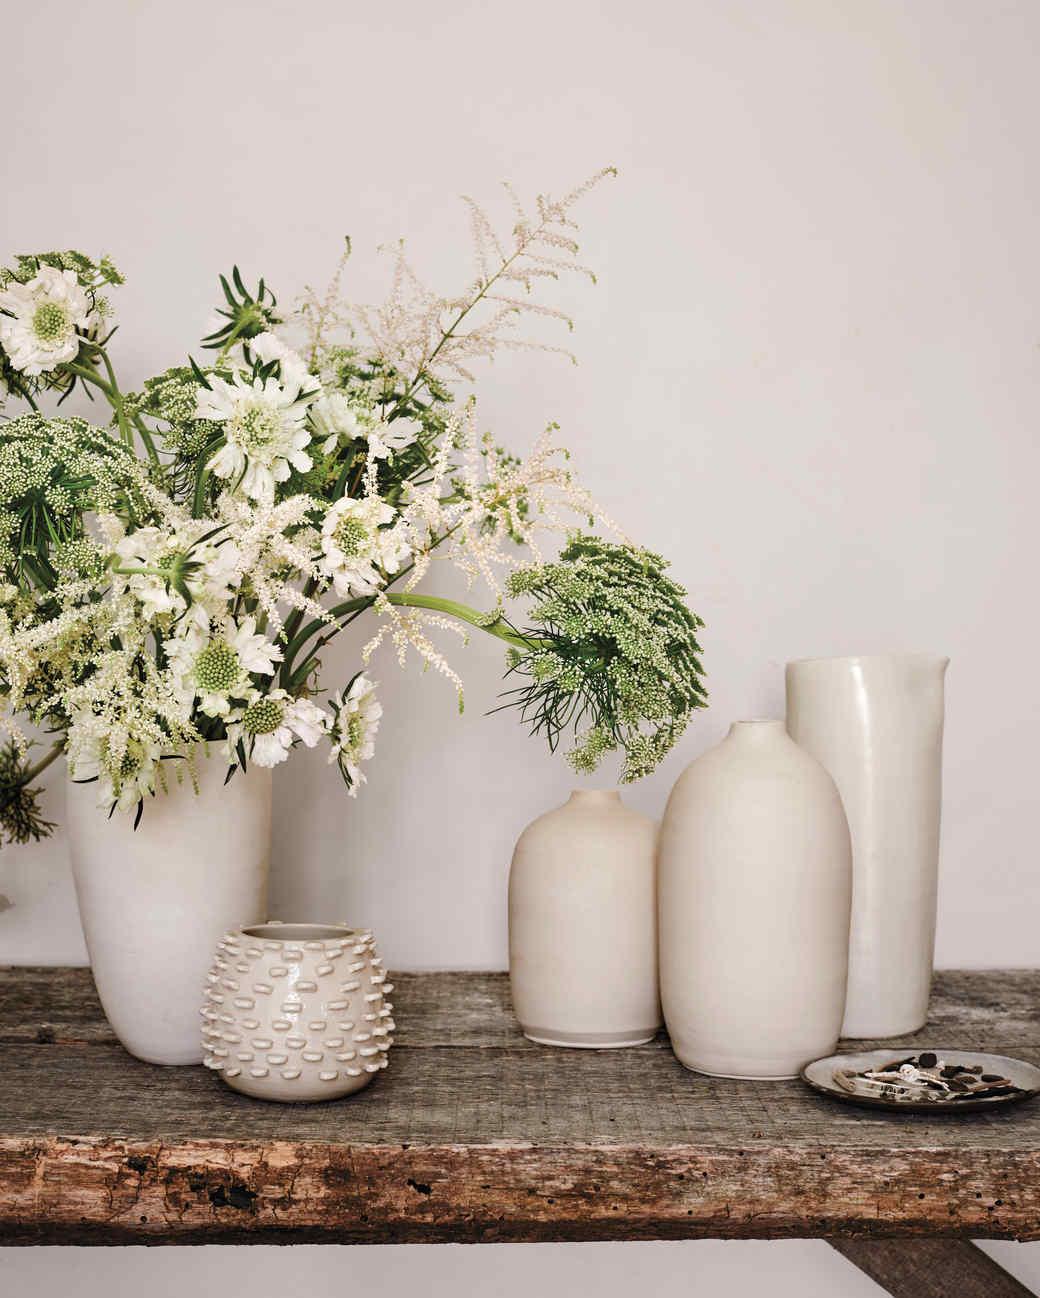 kelli-cain-ceramicist-home-0523-d112172.jpg